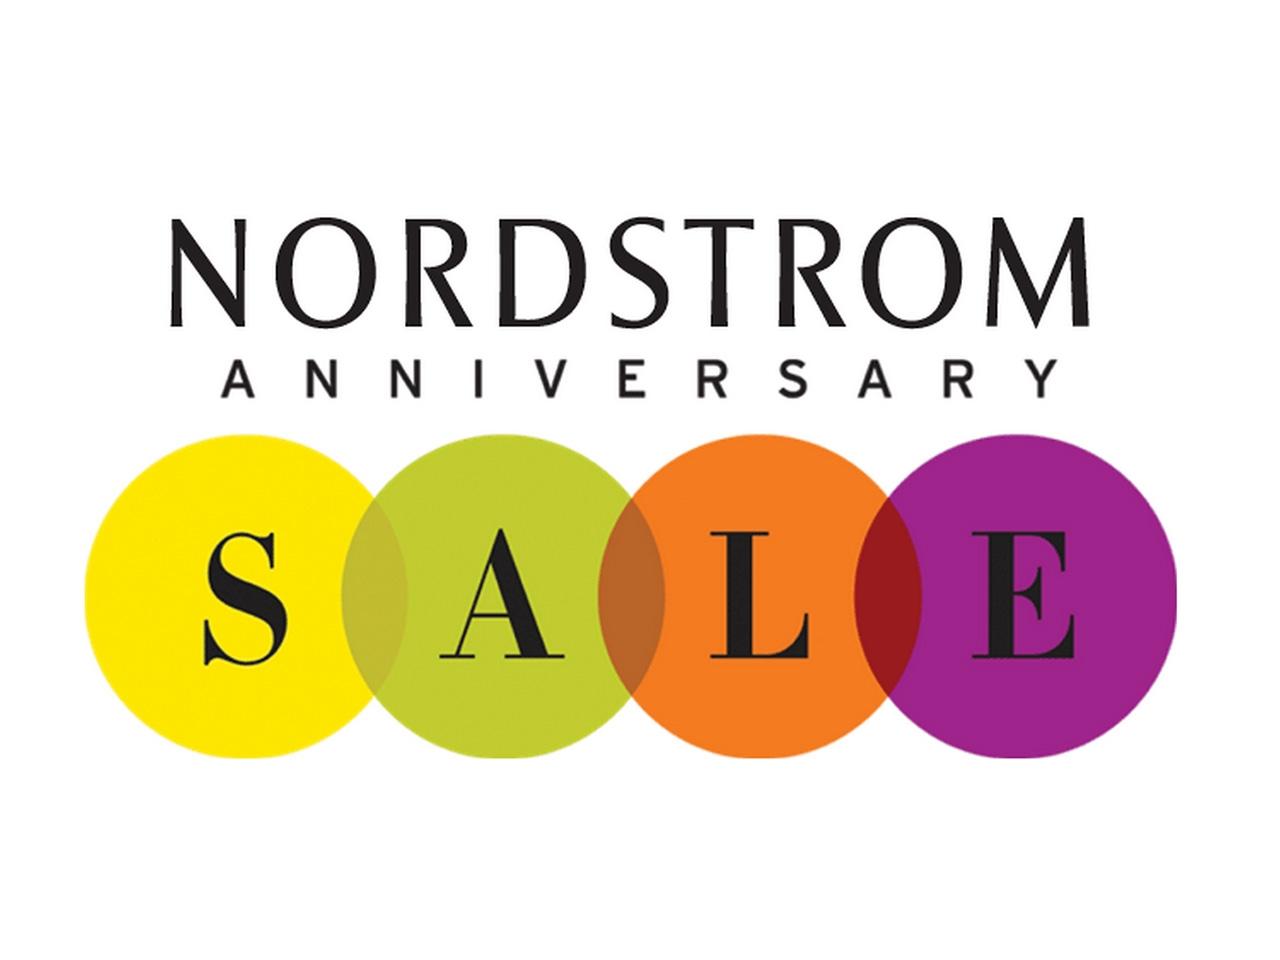 NSale ,Nordstrom Anniversary sale,Sale alert